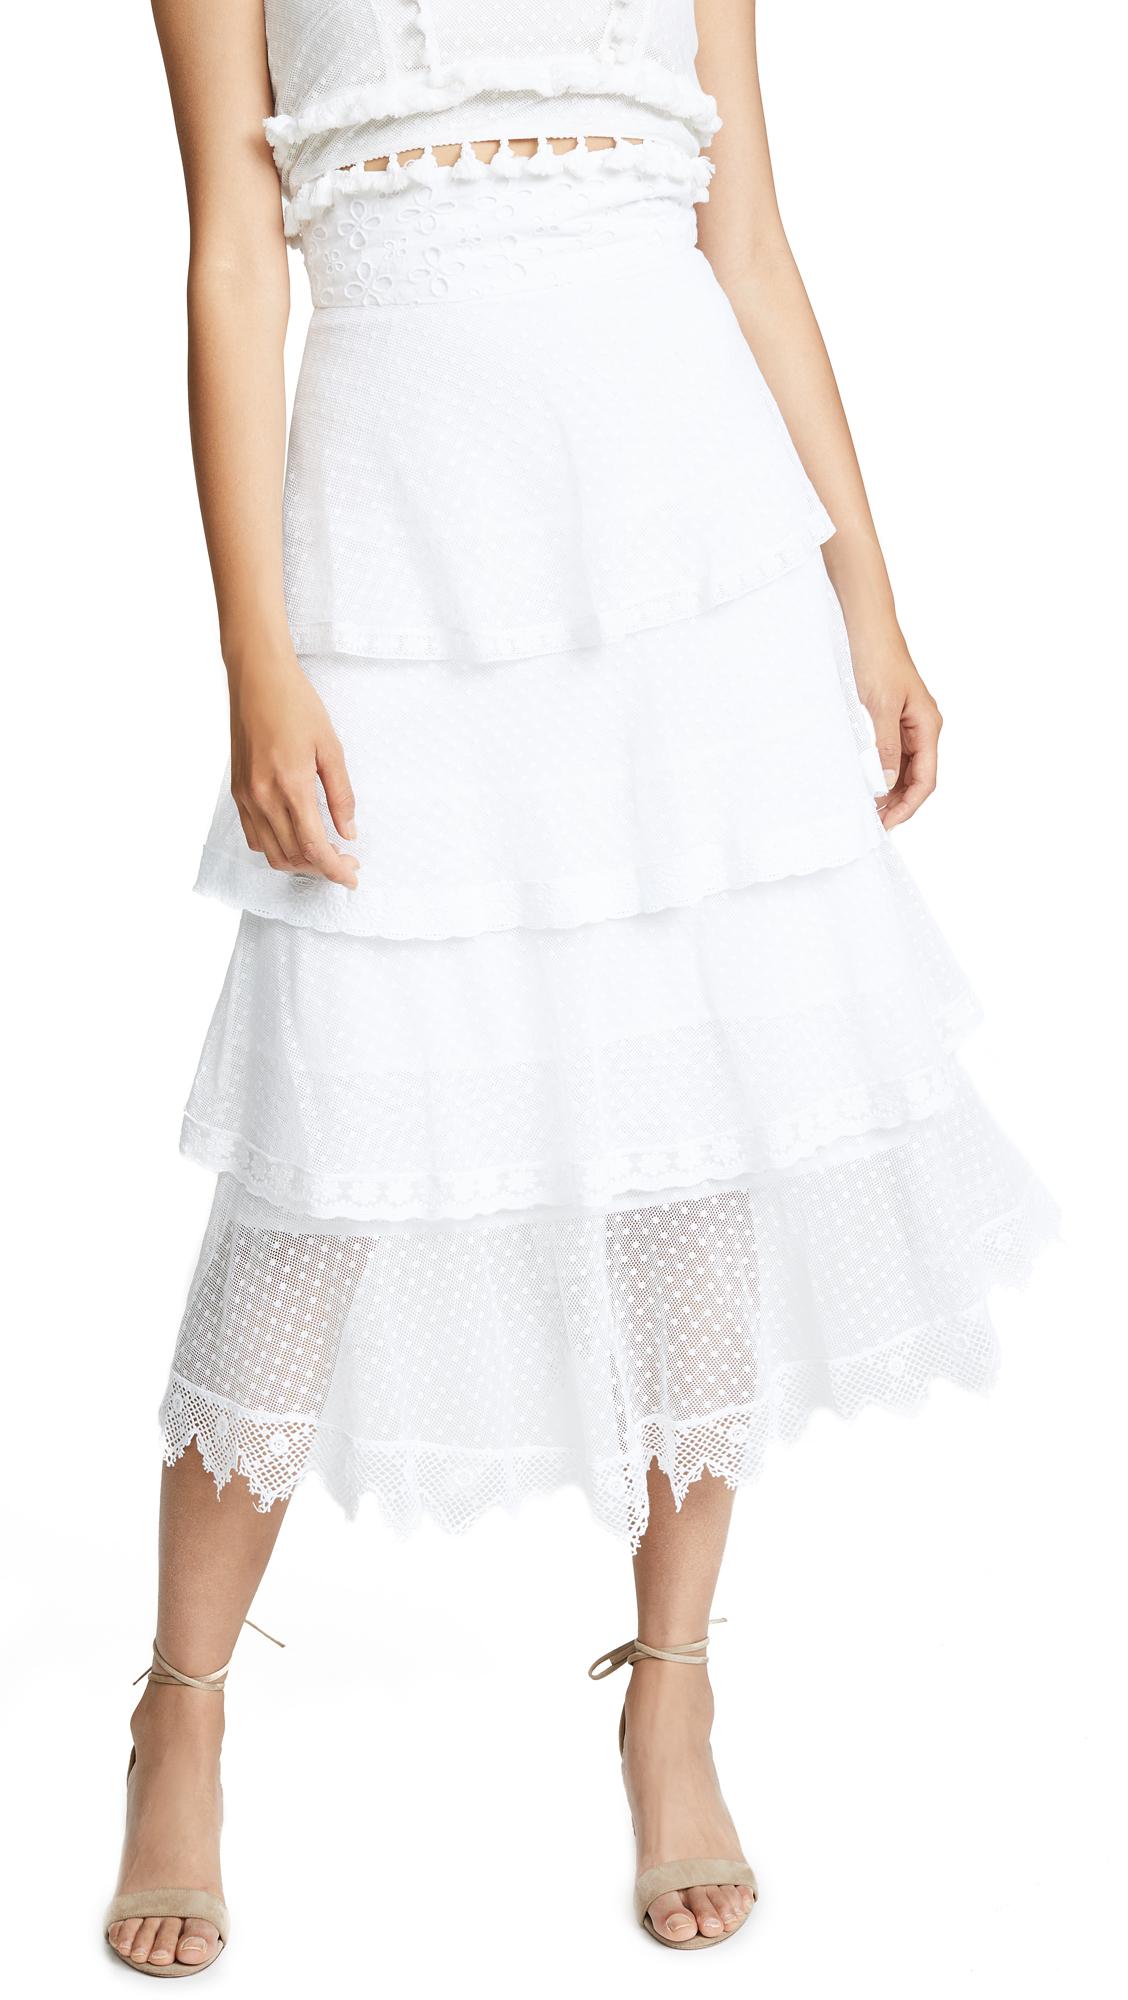 Place Nationale La Baronne High Waist Midi Skirt In White